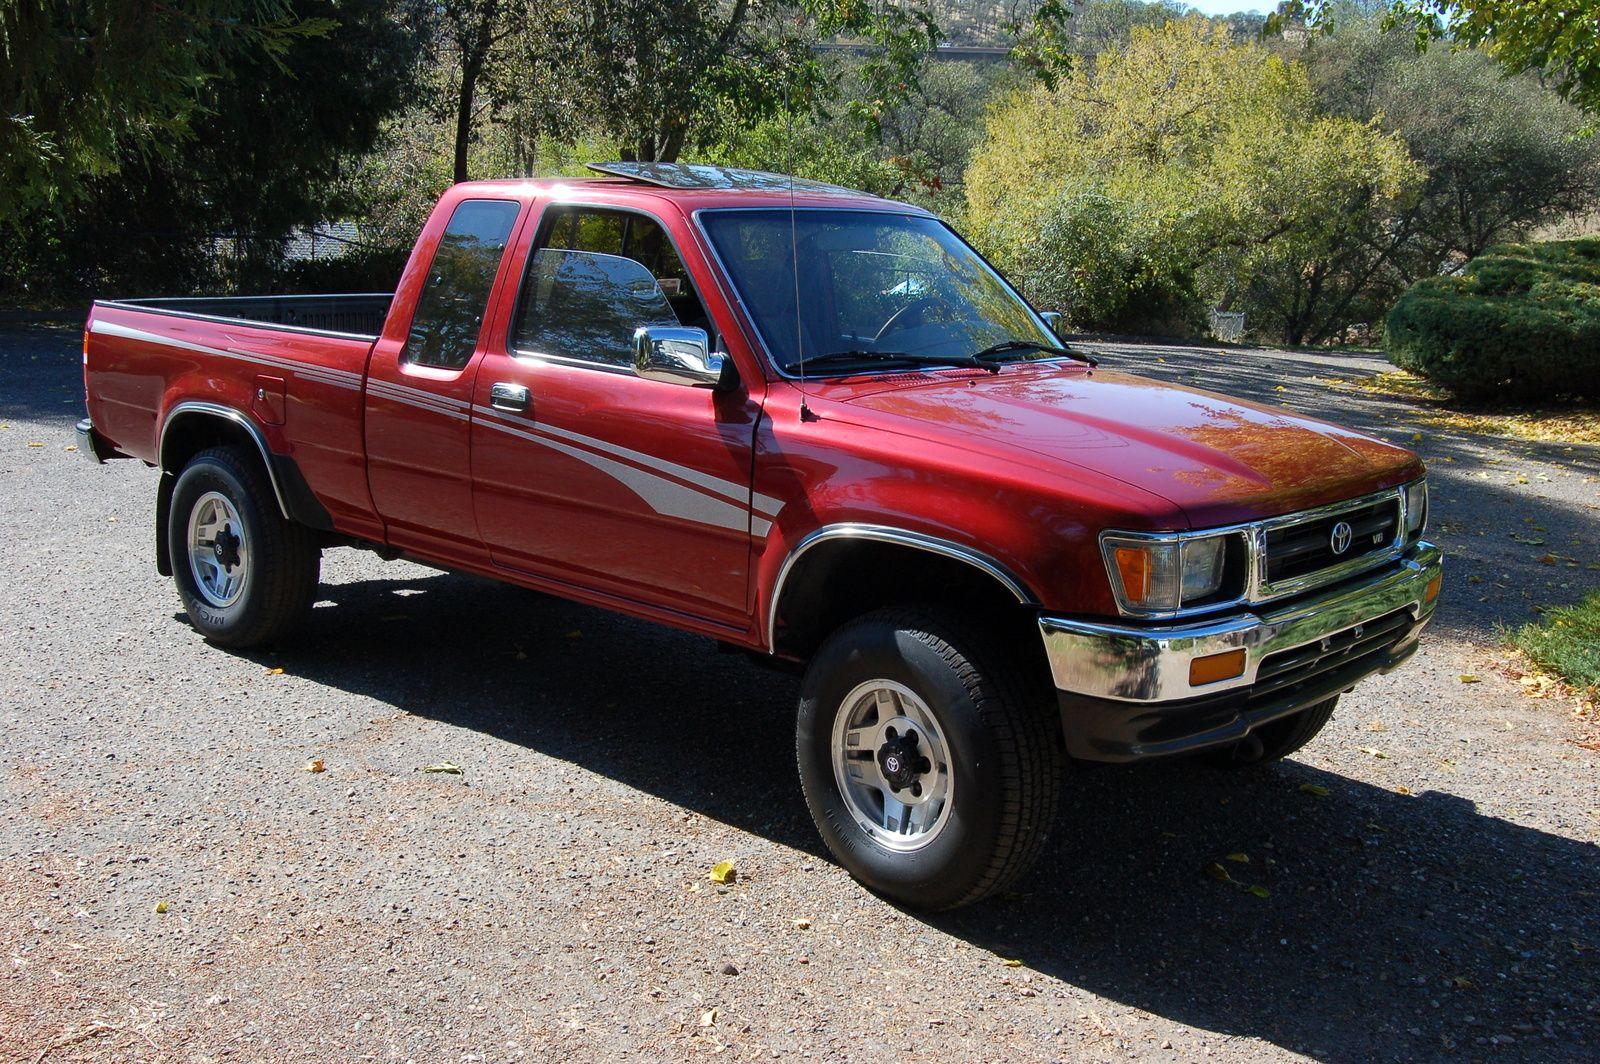 1993 Toyota Pickup Pictures Toyota Trucks Toyota Toyota Pickup 4x4